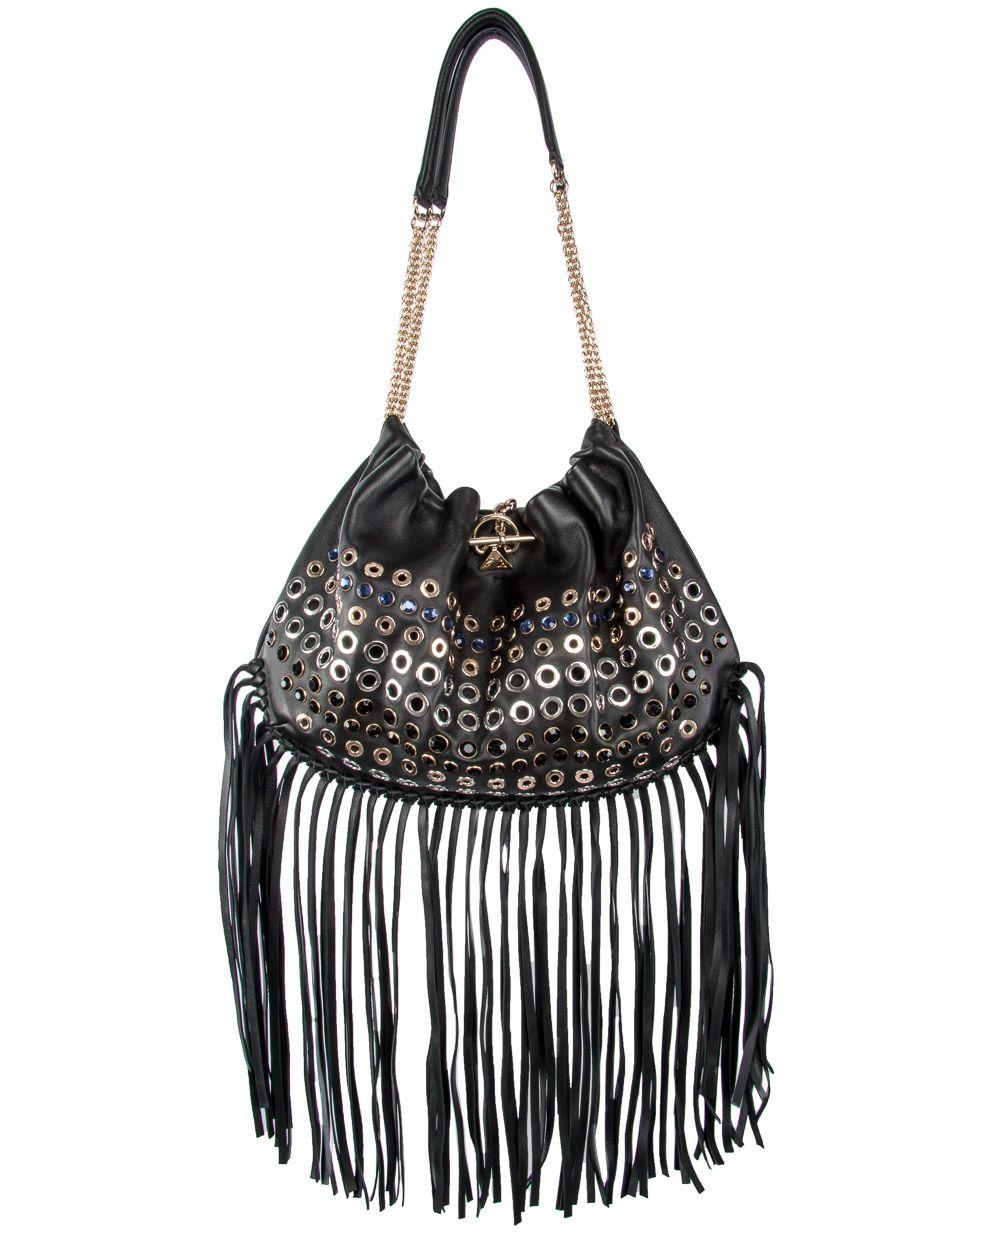 Sonia rykiel black domino fringe shoulder bag anleykorshak